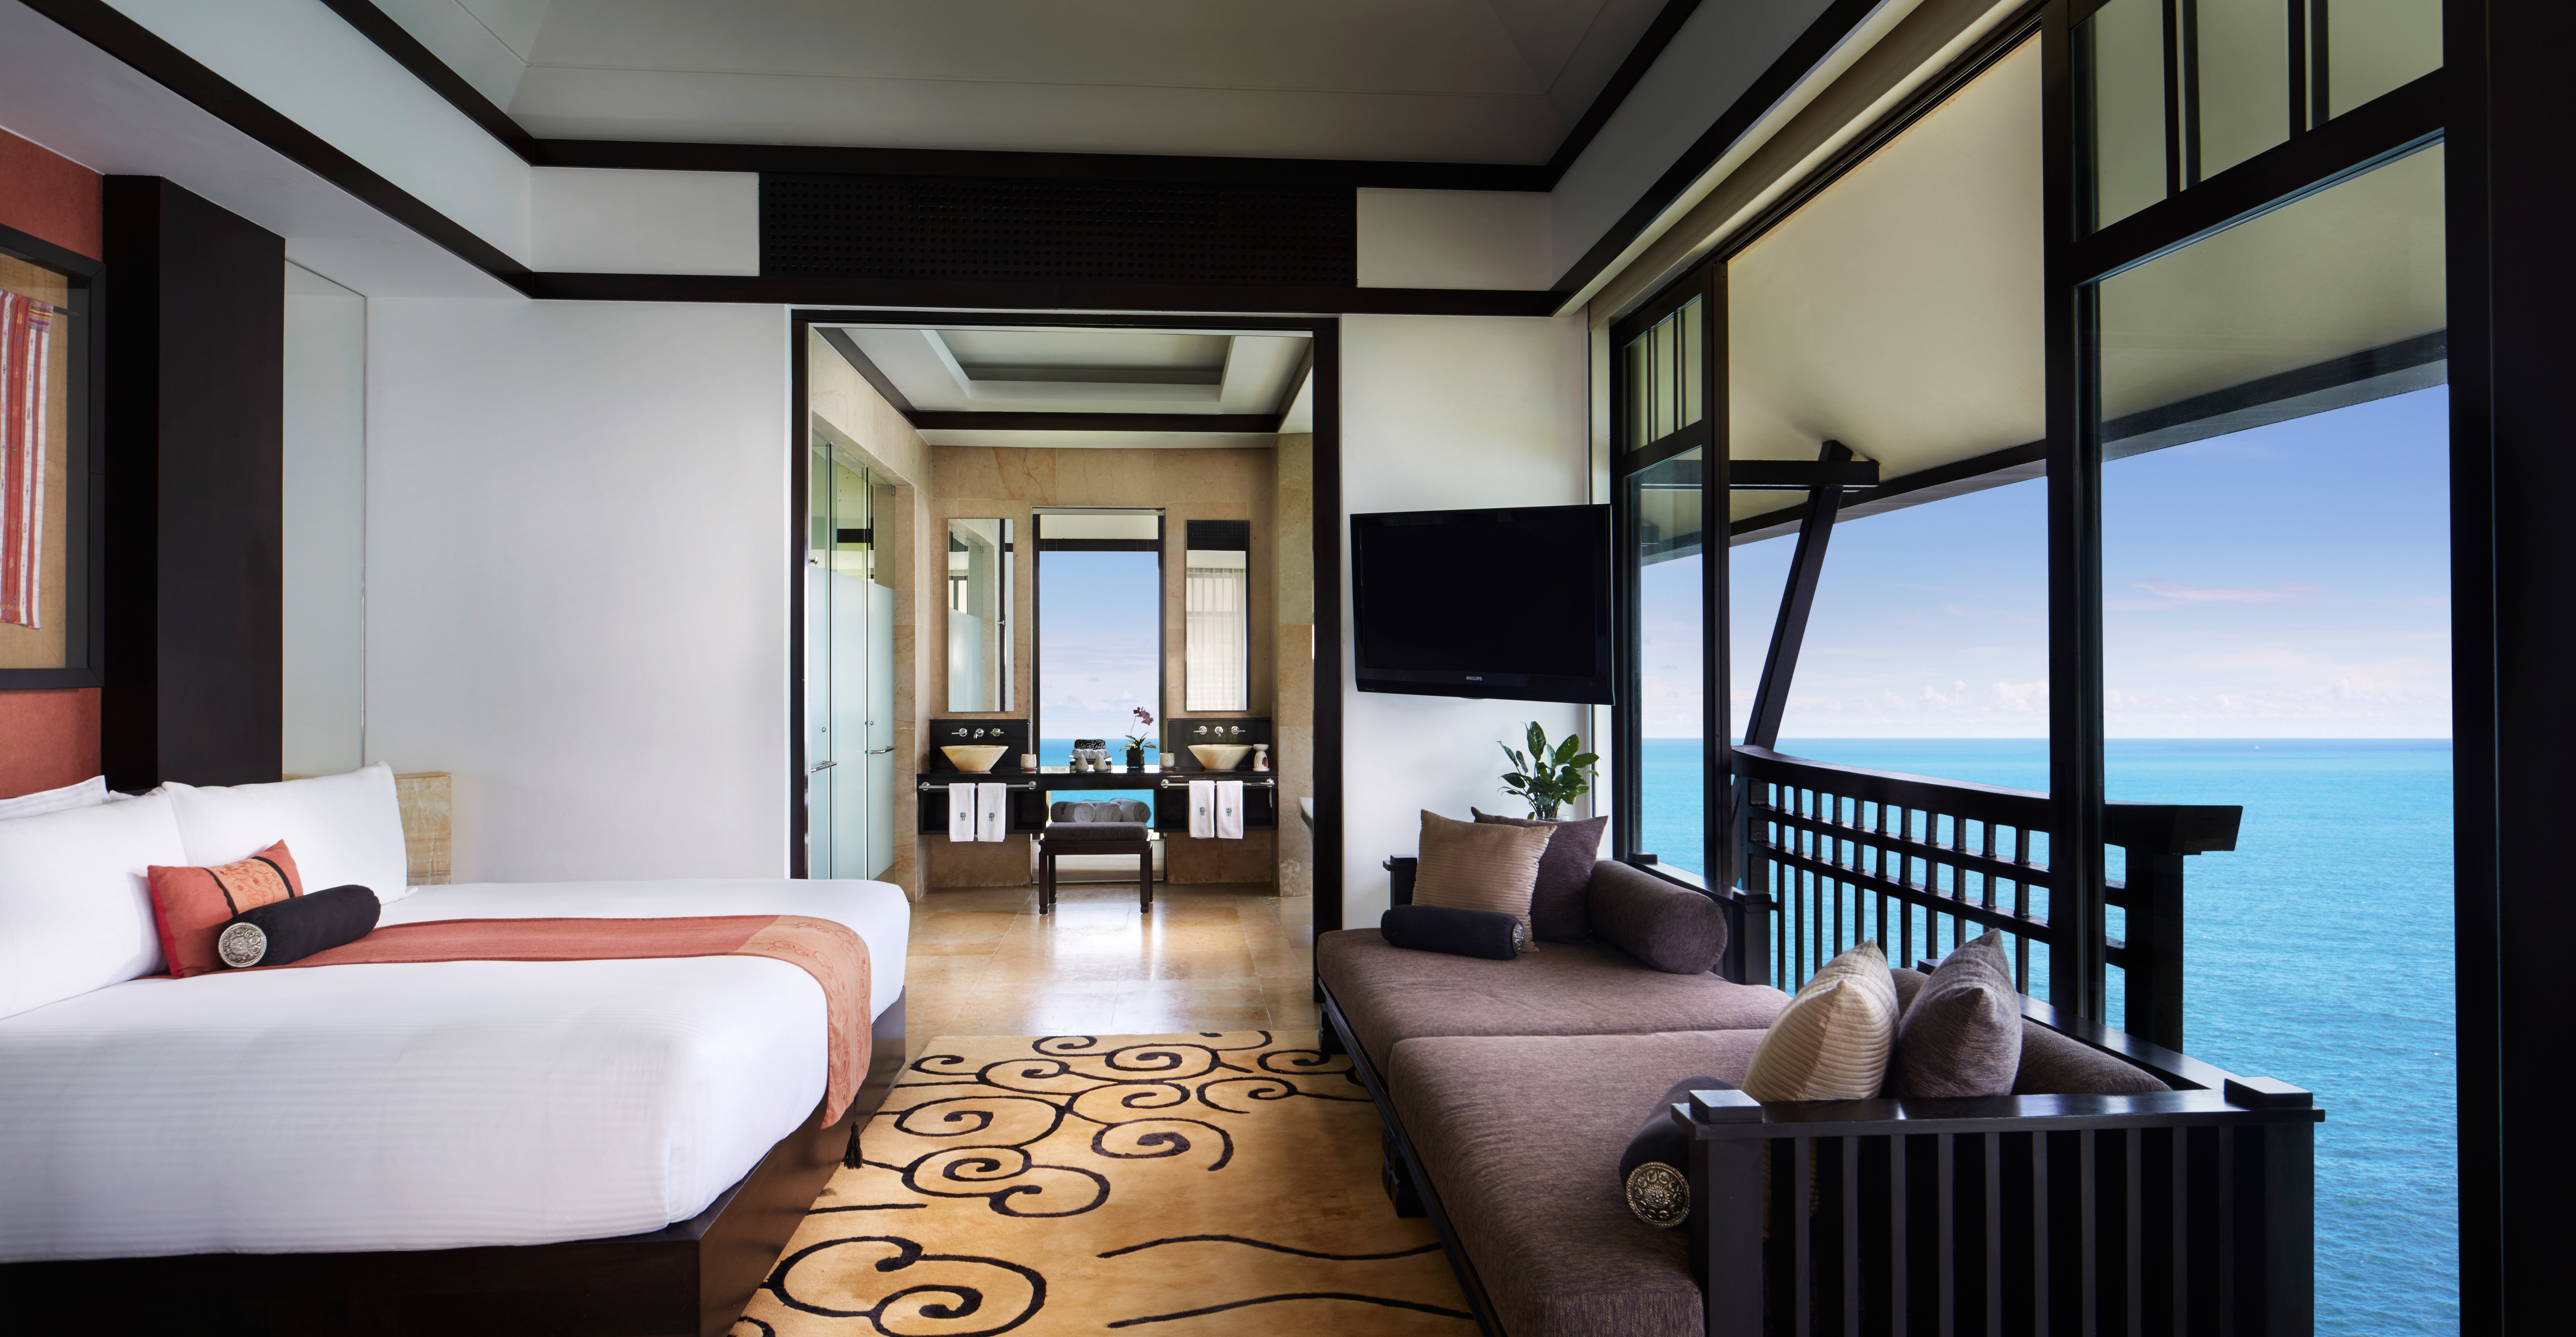 Bedroom Luxury Modern Romantic Scenic views Suite sofa property chair condominium Resort home living room nice Villa mansion cottage